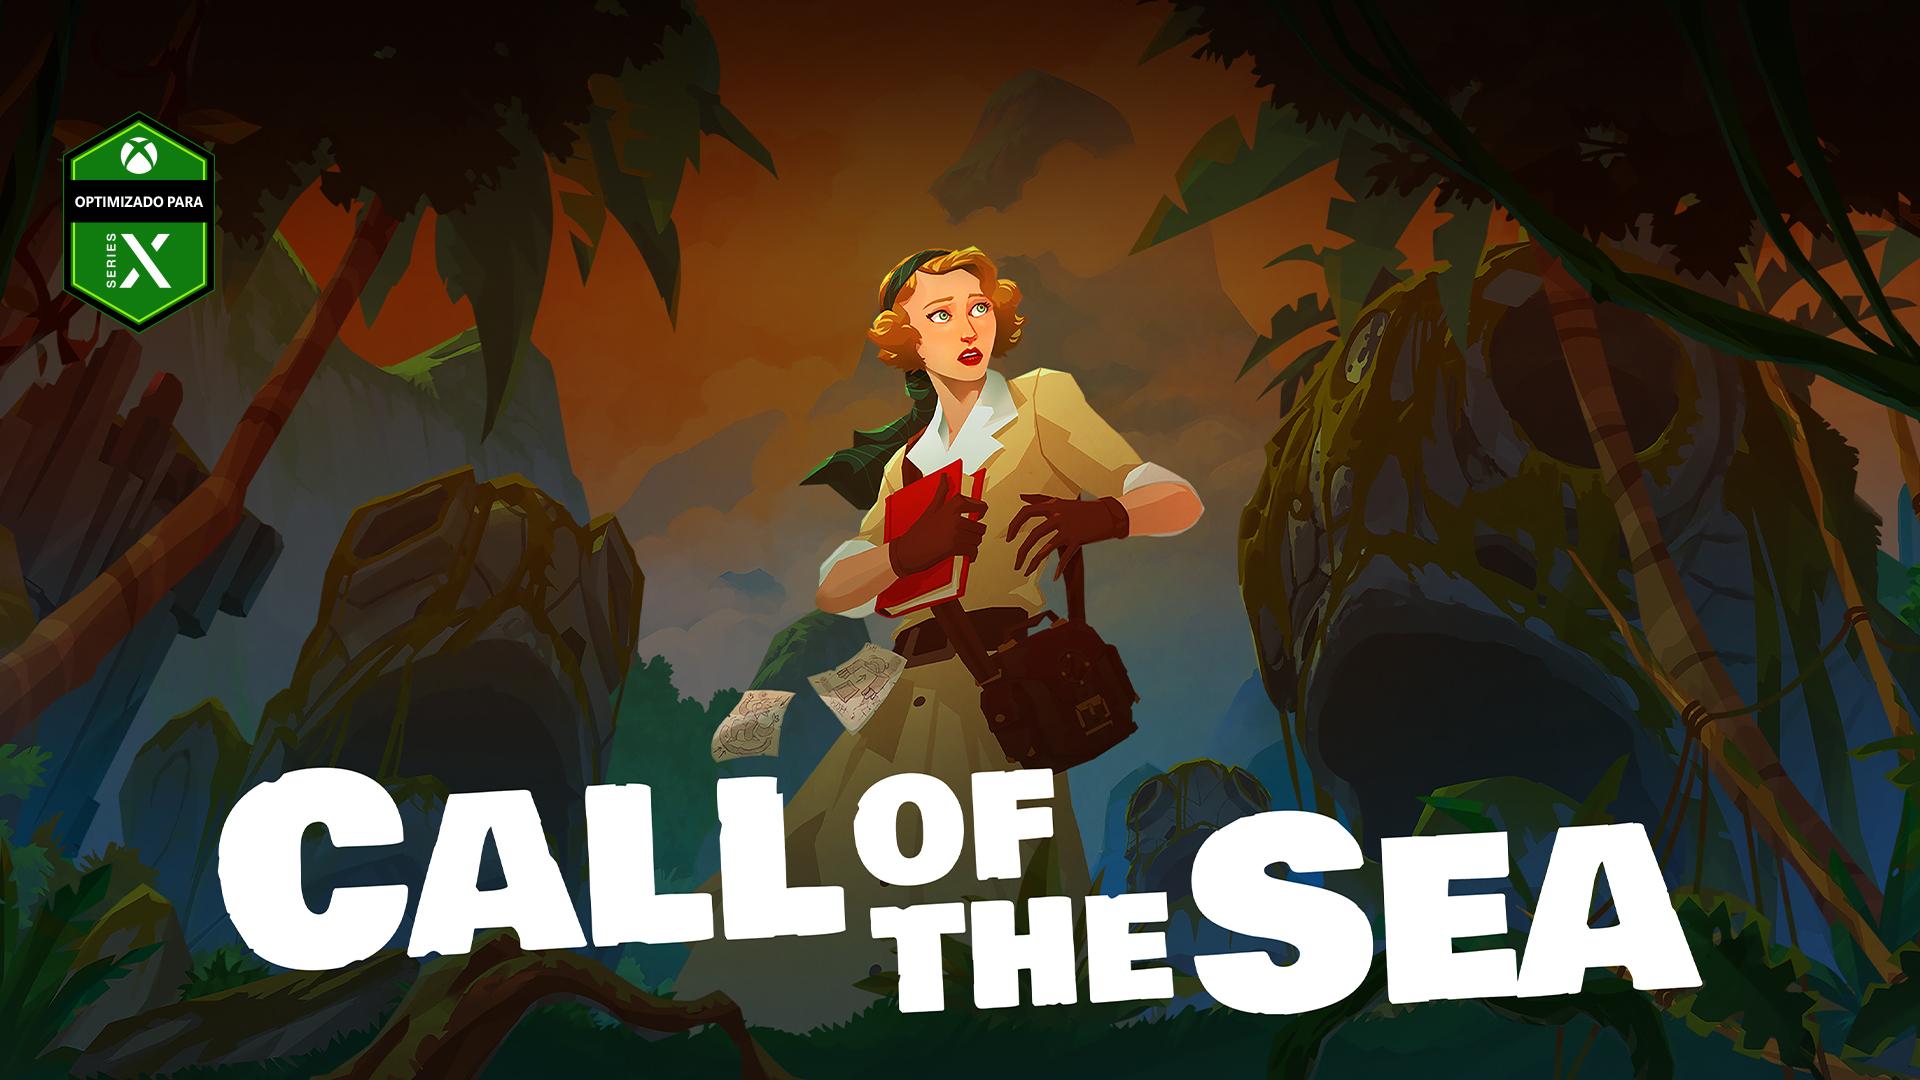 Logotipo de Optimizado para Series X, Call of the Sea, Norah en una jungla